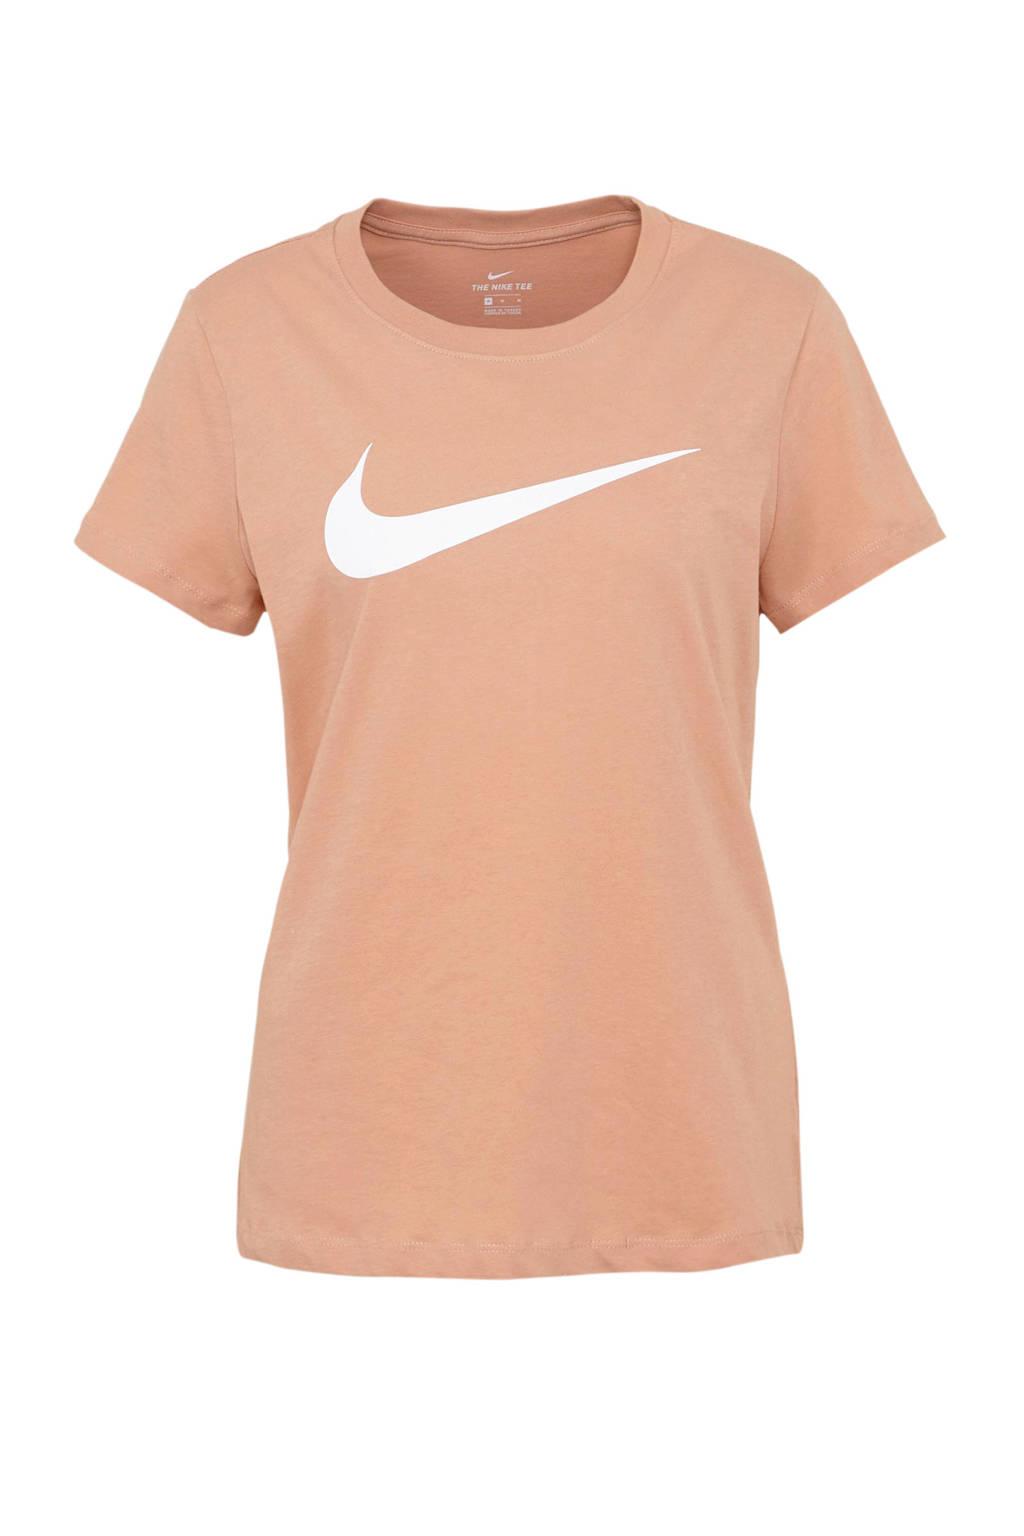 Nike T-shirt oudroze, Oudroze